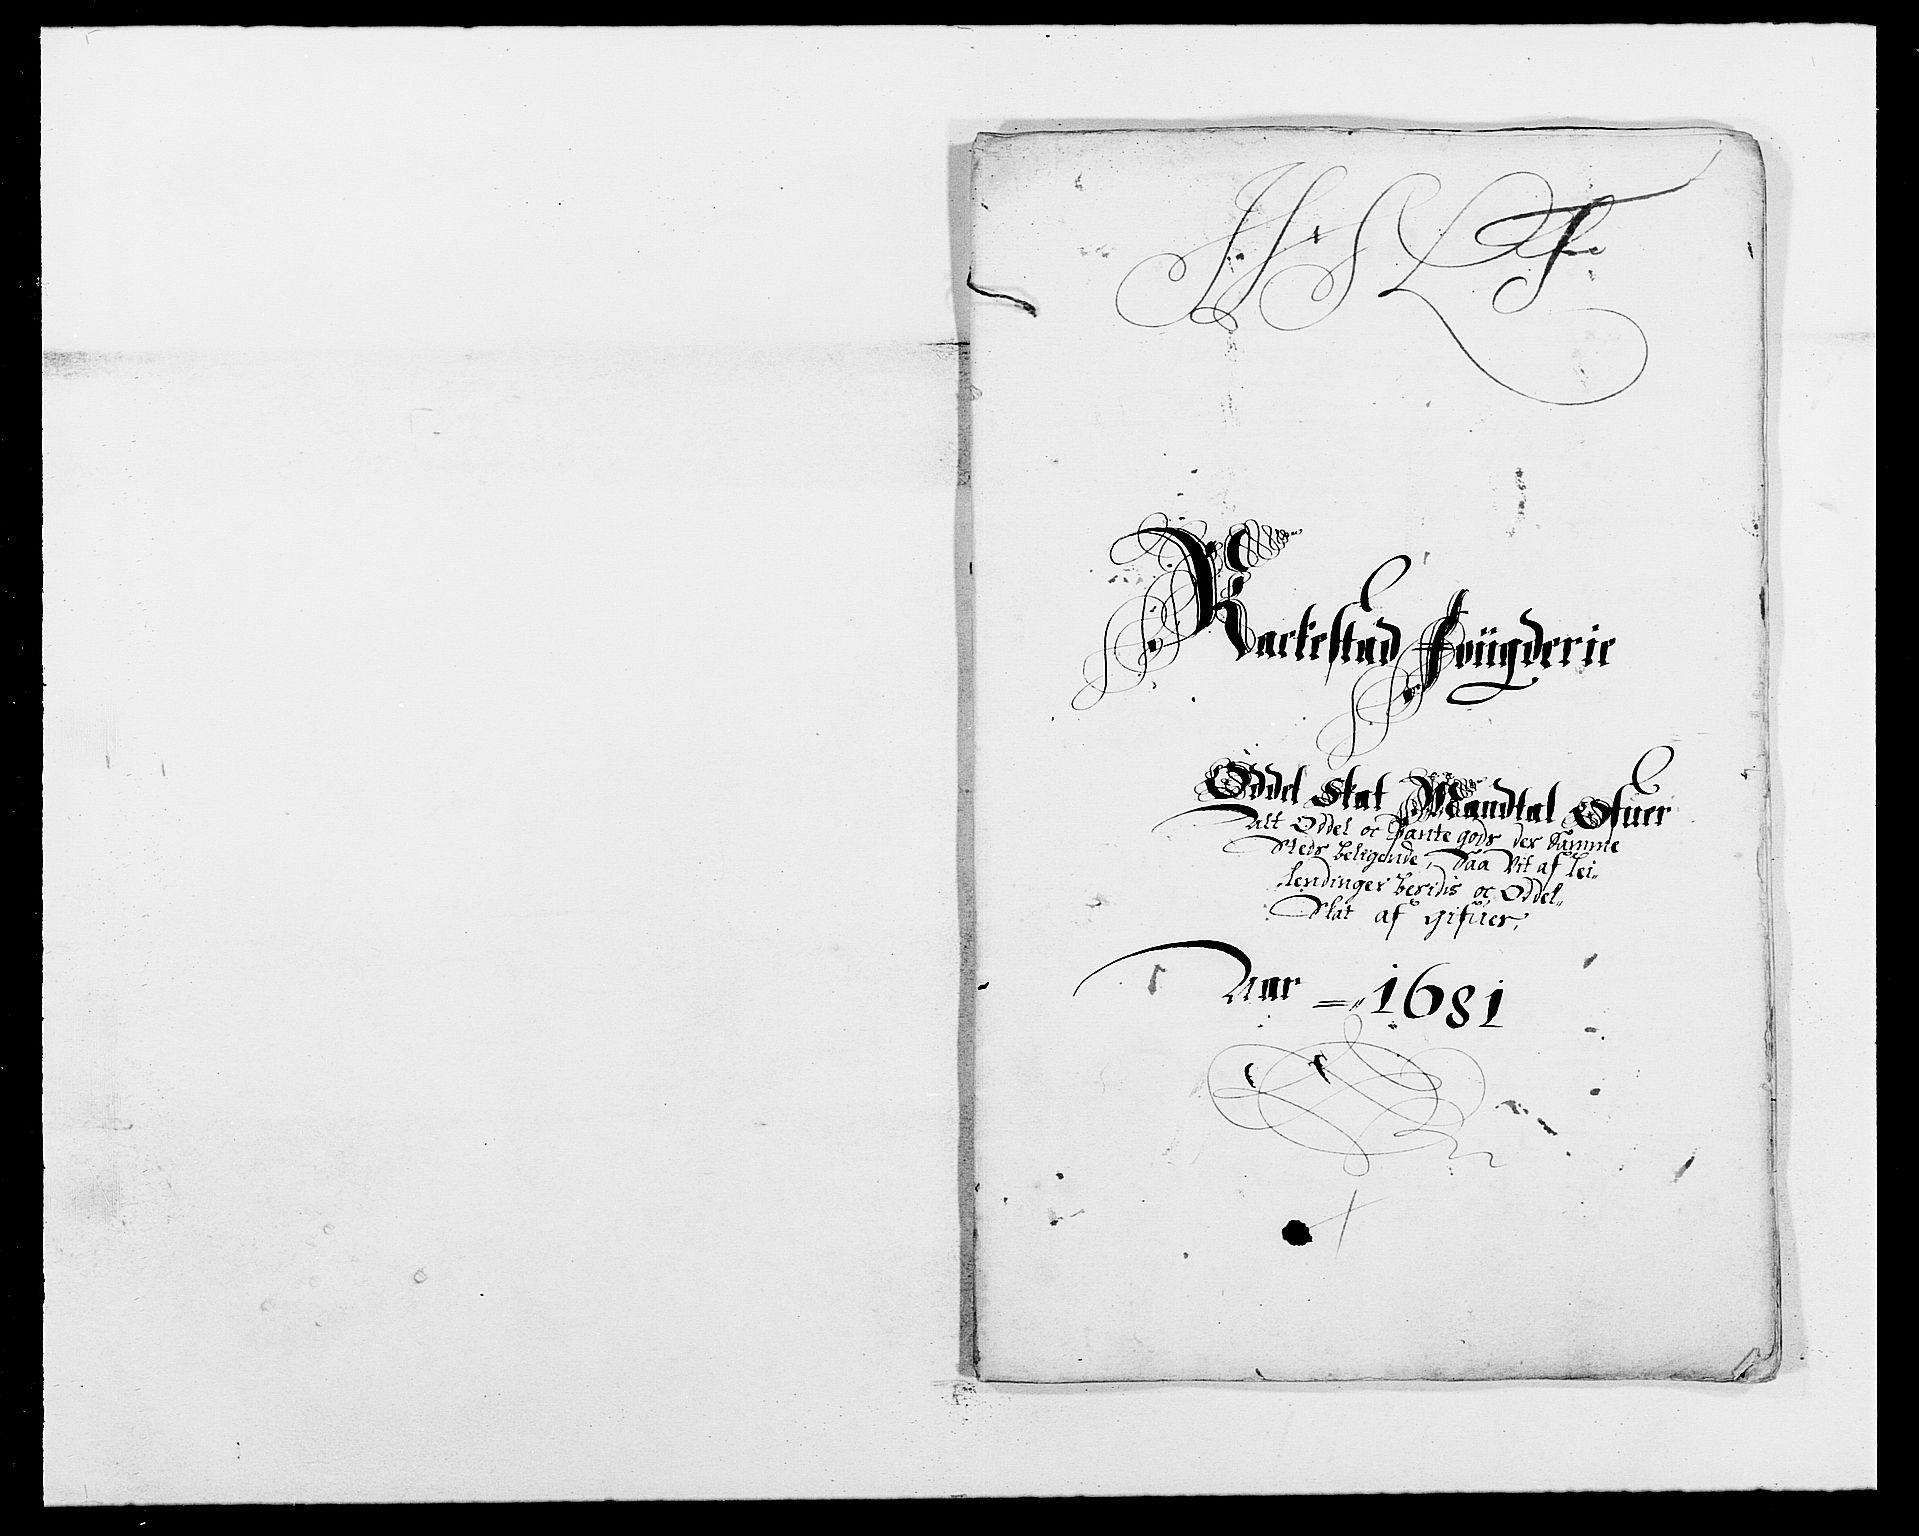 RA, Rentekammeret inntil 1814, Reviderte regnskaper, Fogderegnskap, R05/L0272: Fogderegnskap Rakkestad, 1680-1681, s. 338